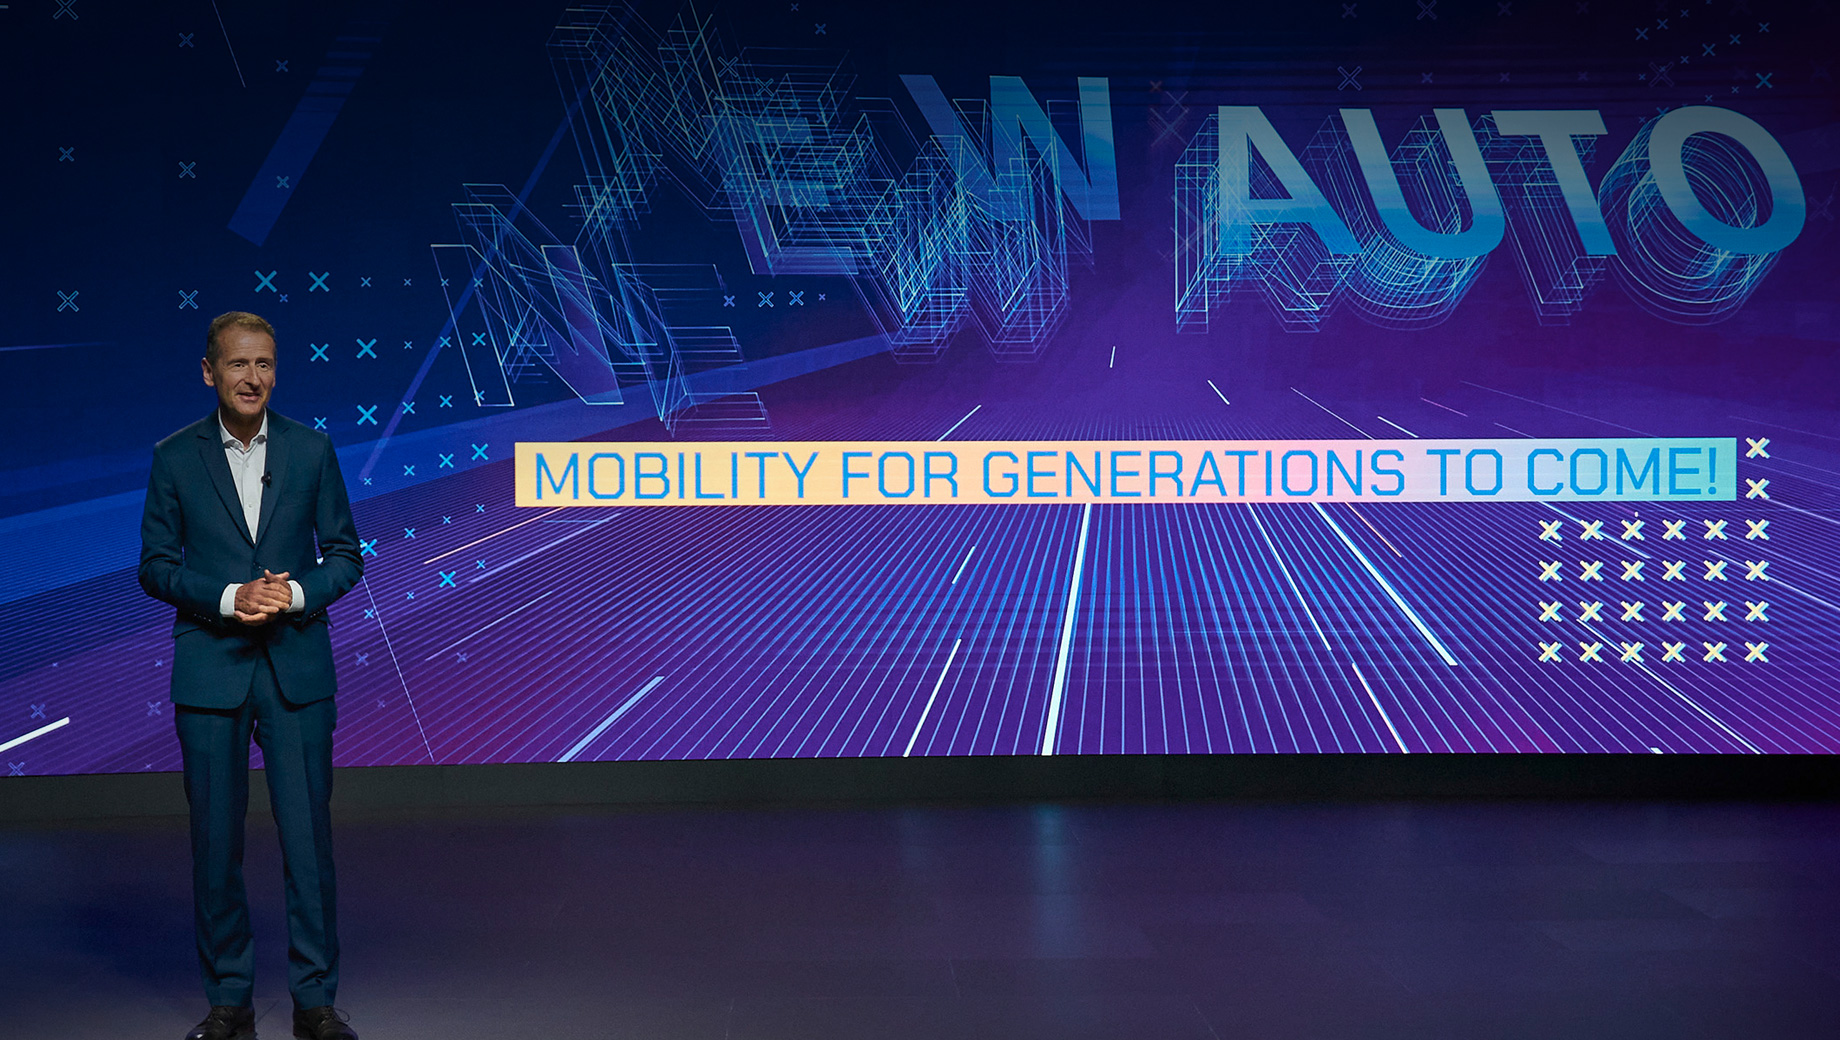 Группа Volkswagen обрисовала стратегию и единую платформу